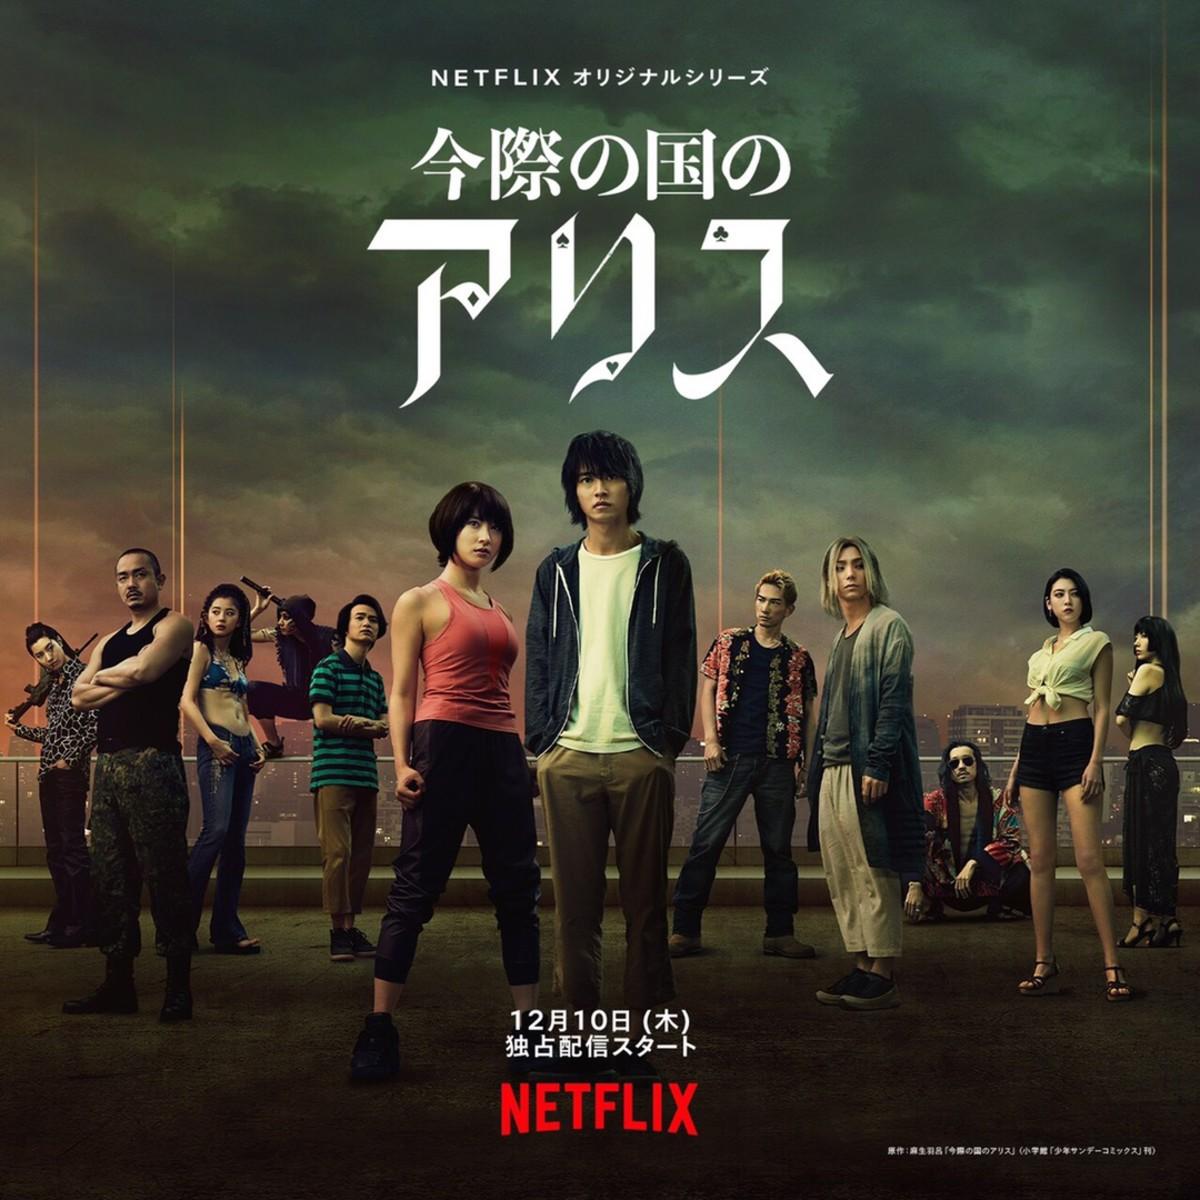 Parallels: The Japanese Series Alice in Borderland Season 1 vs. Alice in Wonderland